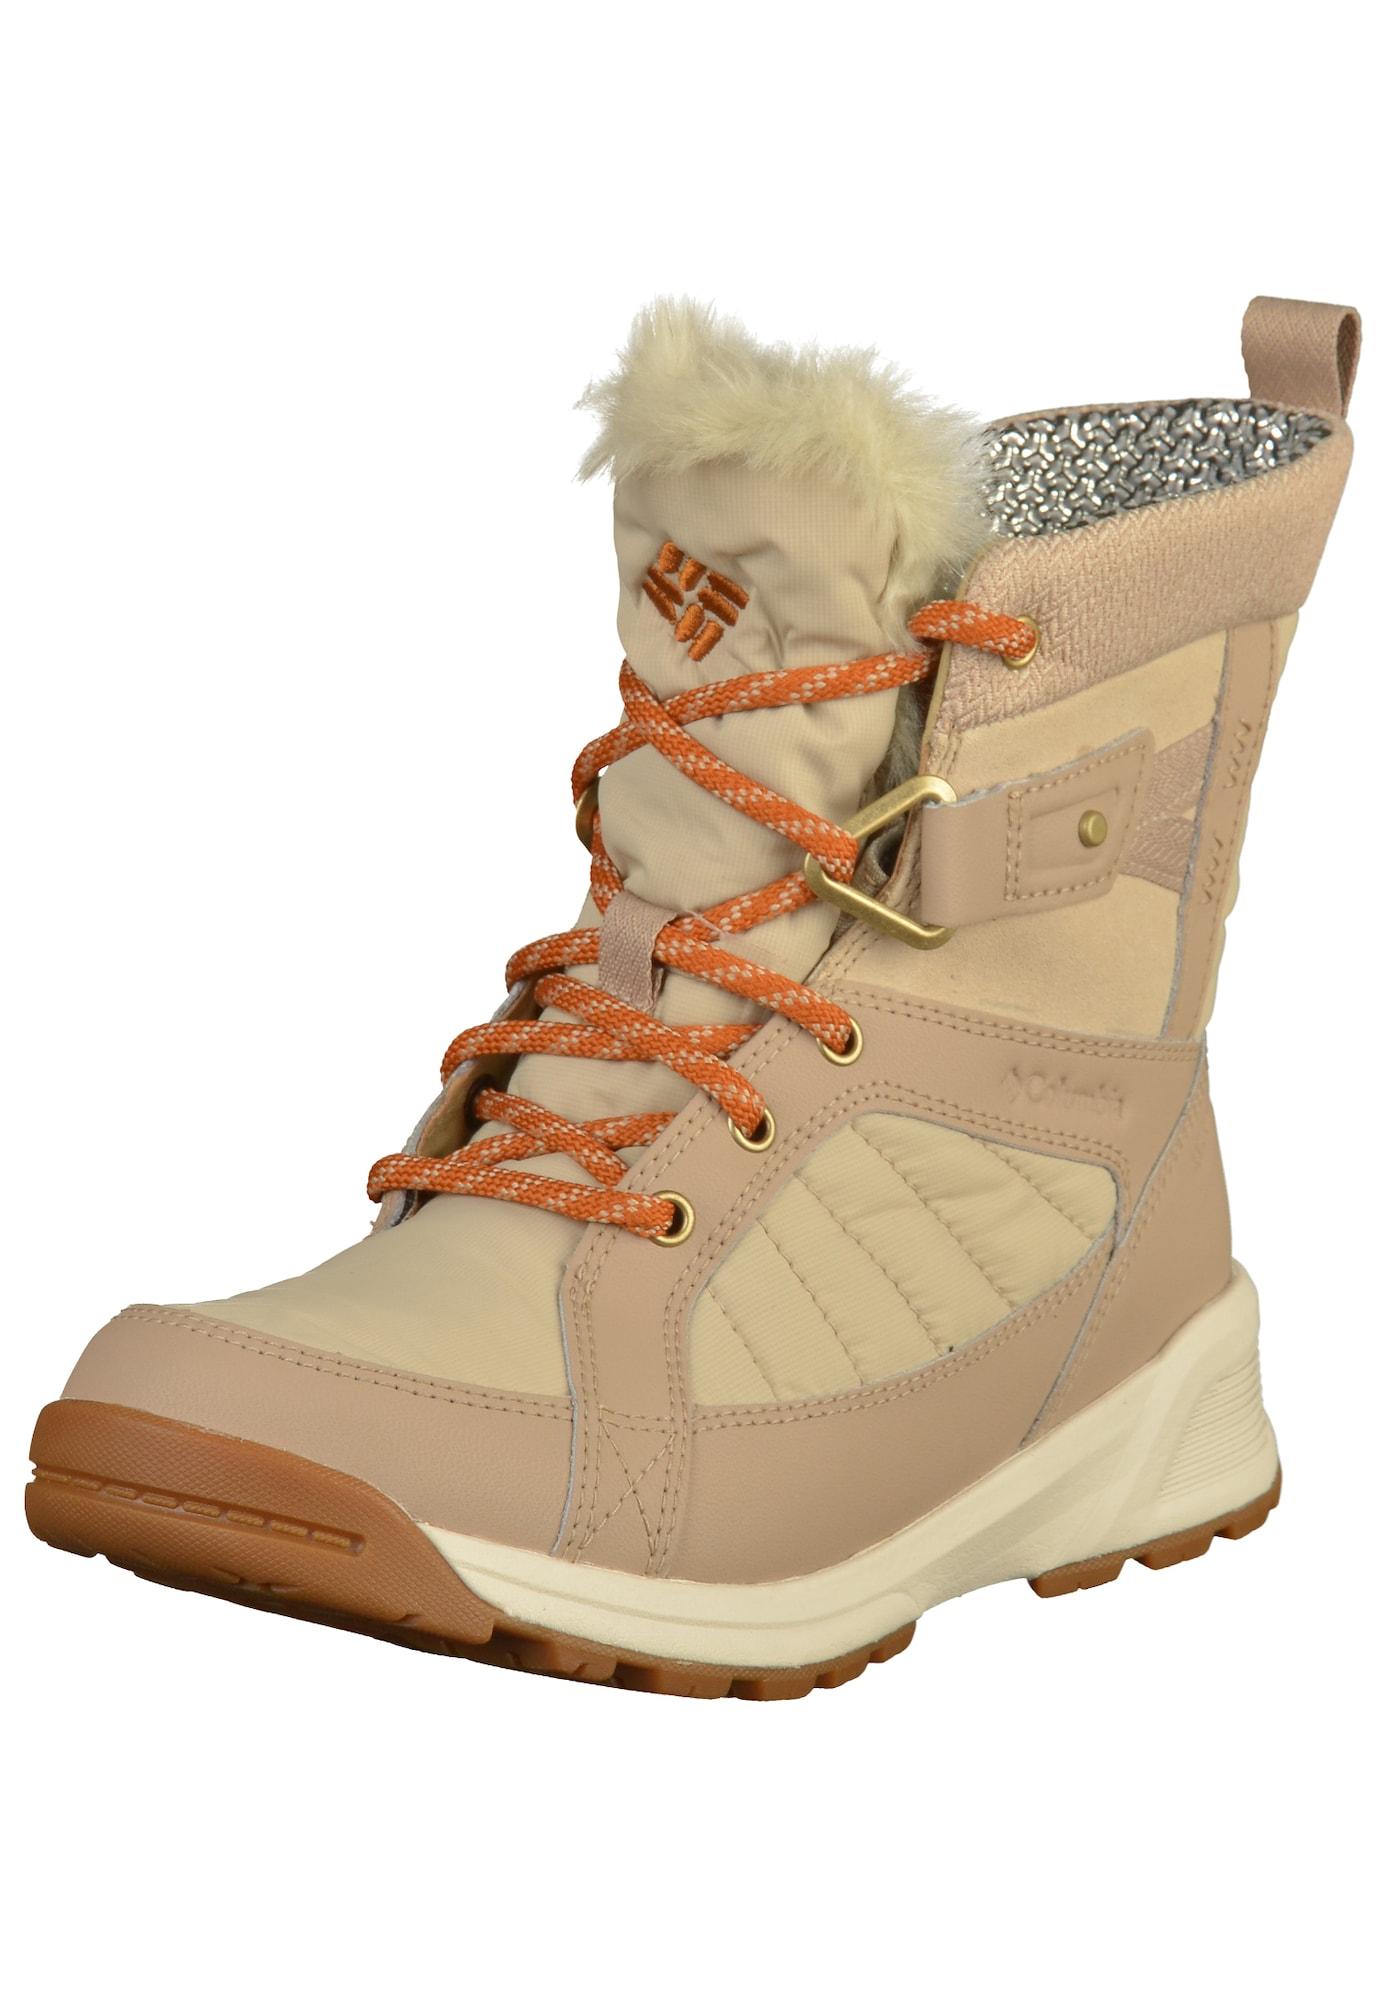 Winterstiefel 'Meadows Shorty Omni-Heat 3D' | Schuhe > Stiefel > Winterstiefel | Hellbeige - Cappuccino | Columbia